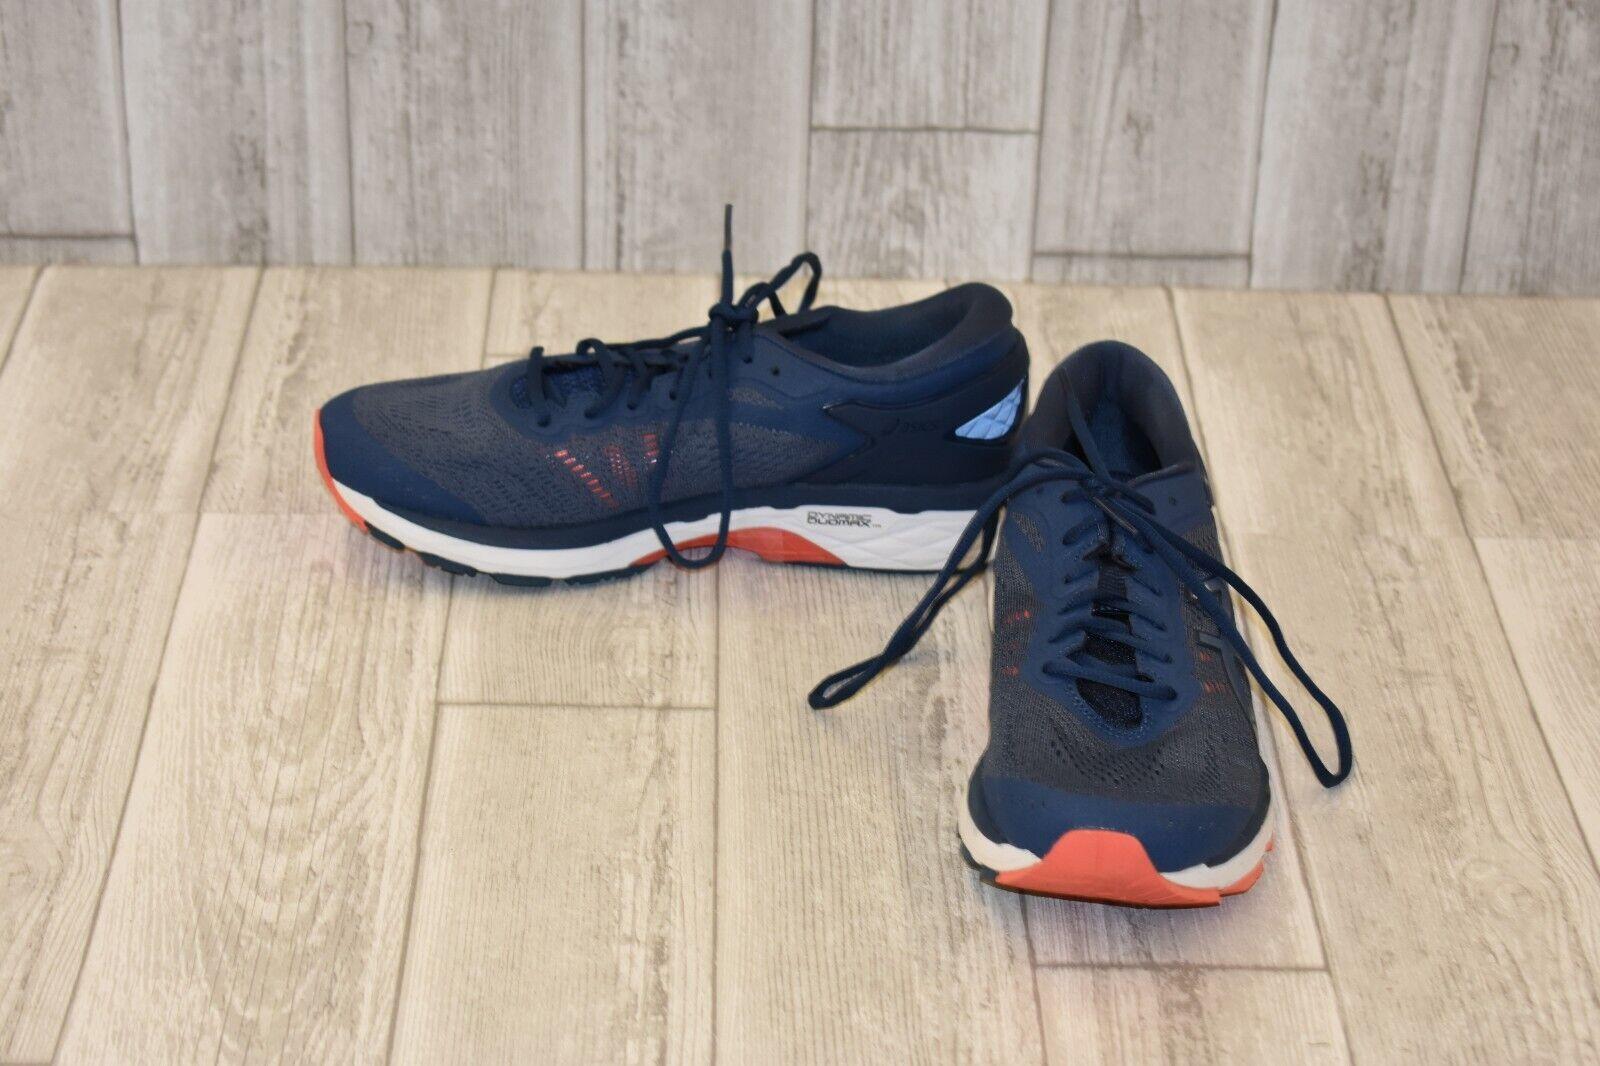 Asics Gel-Kayano 24 Athletic shoes - Men's Size 9 - bluee